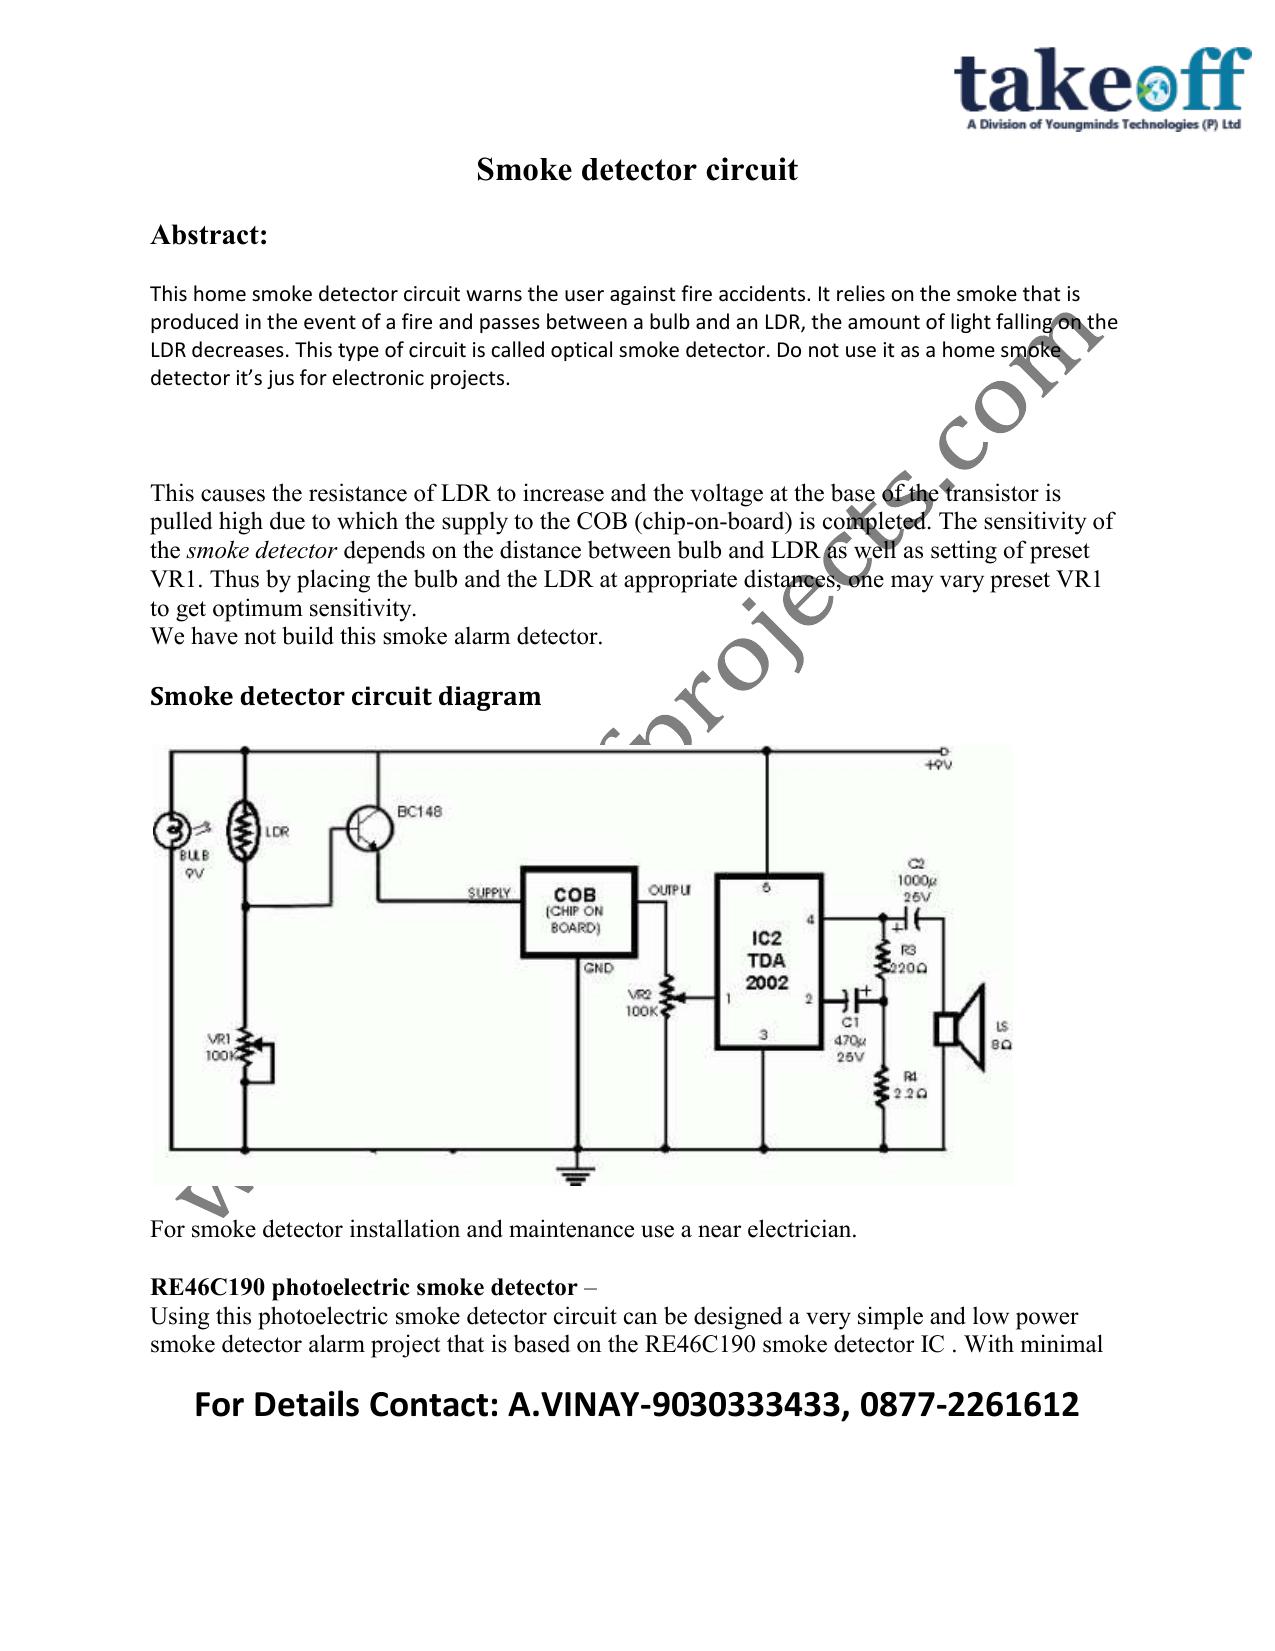 Smoke Detector Circuit Diagram Flame Photocell Wiring 006865160 1 626da66ee9d1e794fc5dcbe25027c9f3